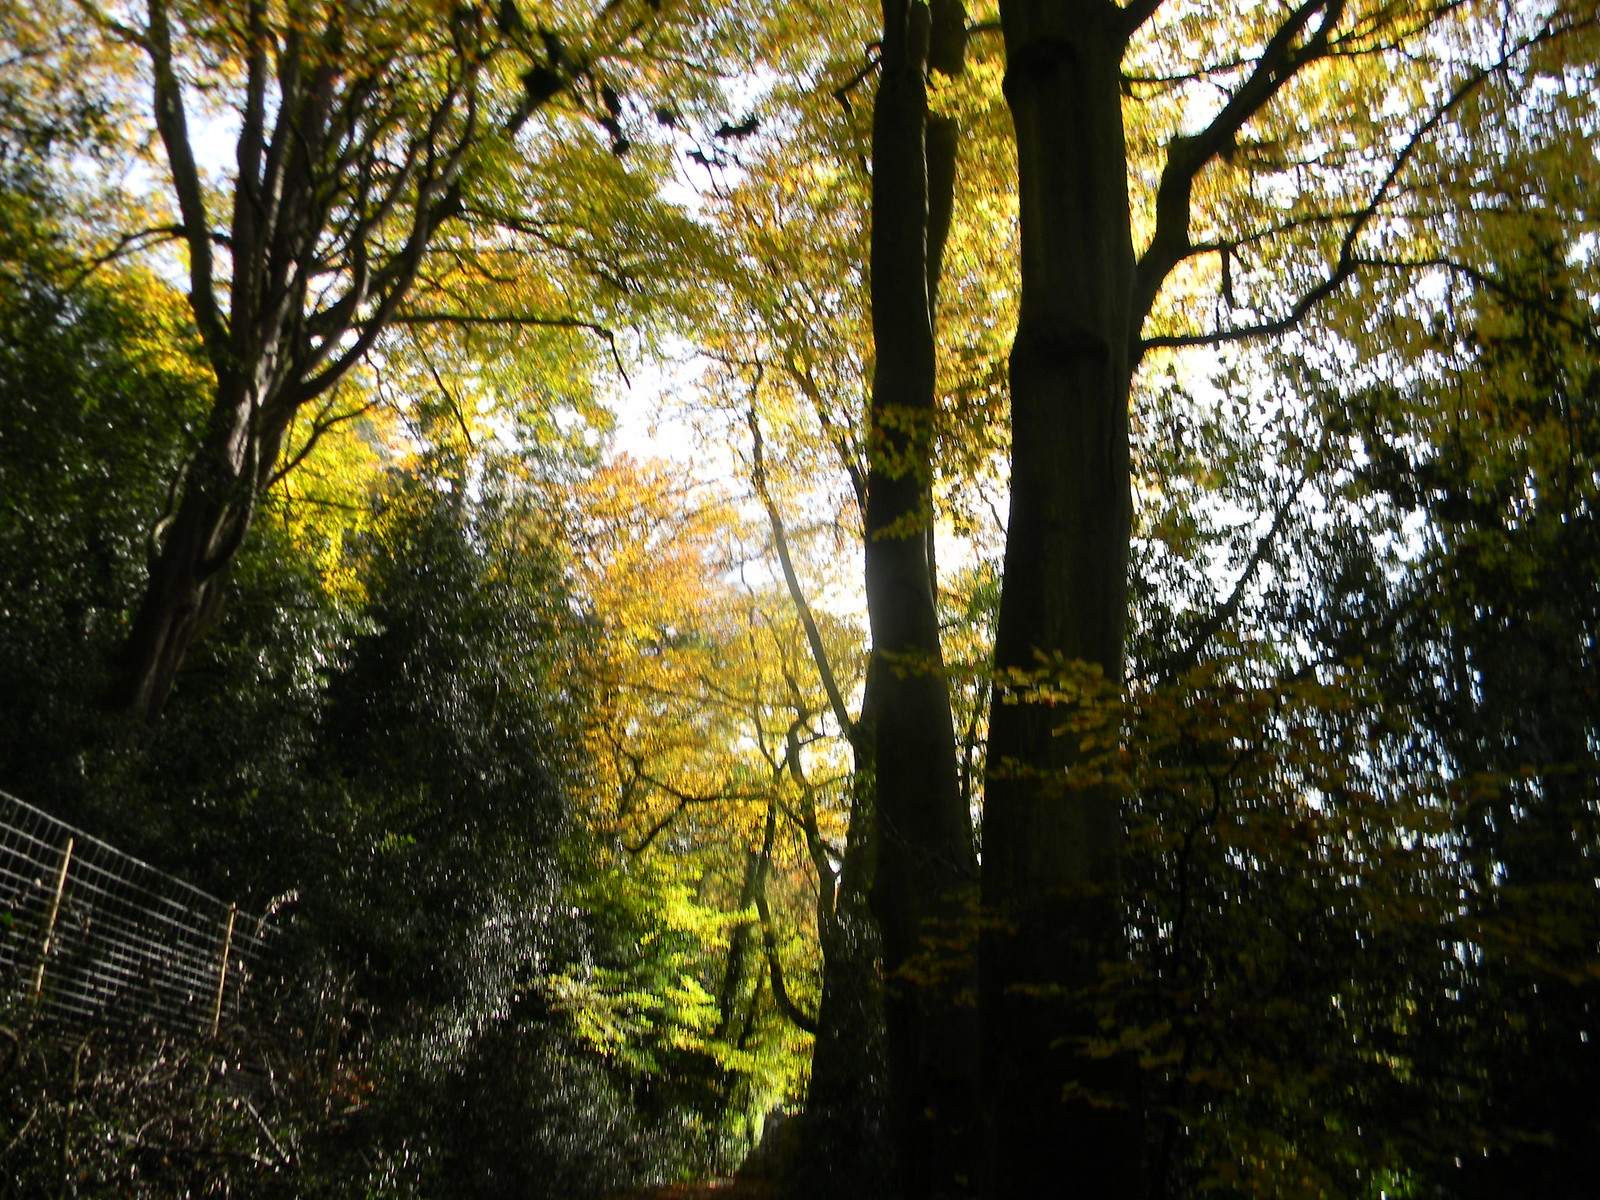 Autumn leaves Farnham to Godalming Wednesday Walk